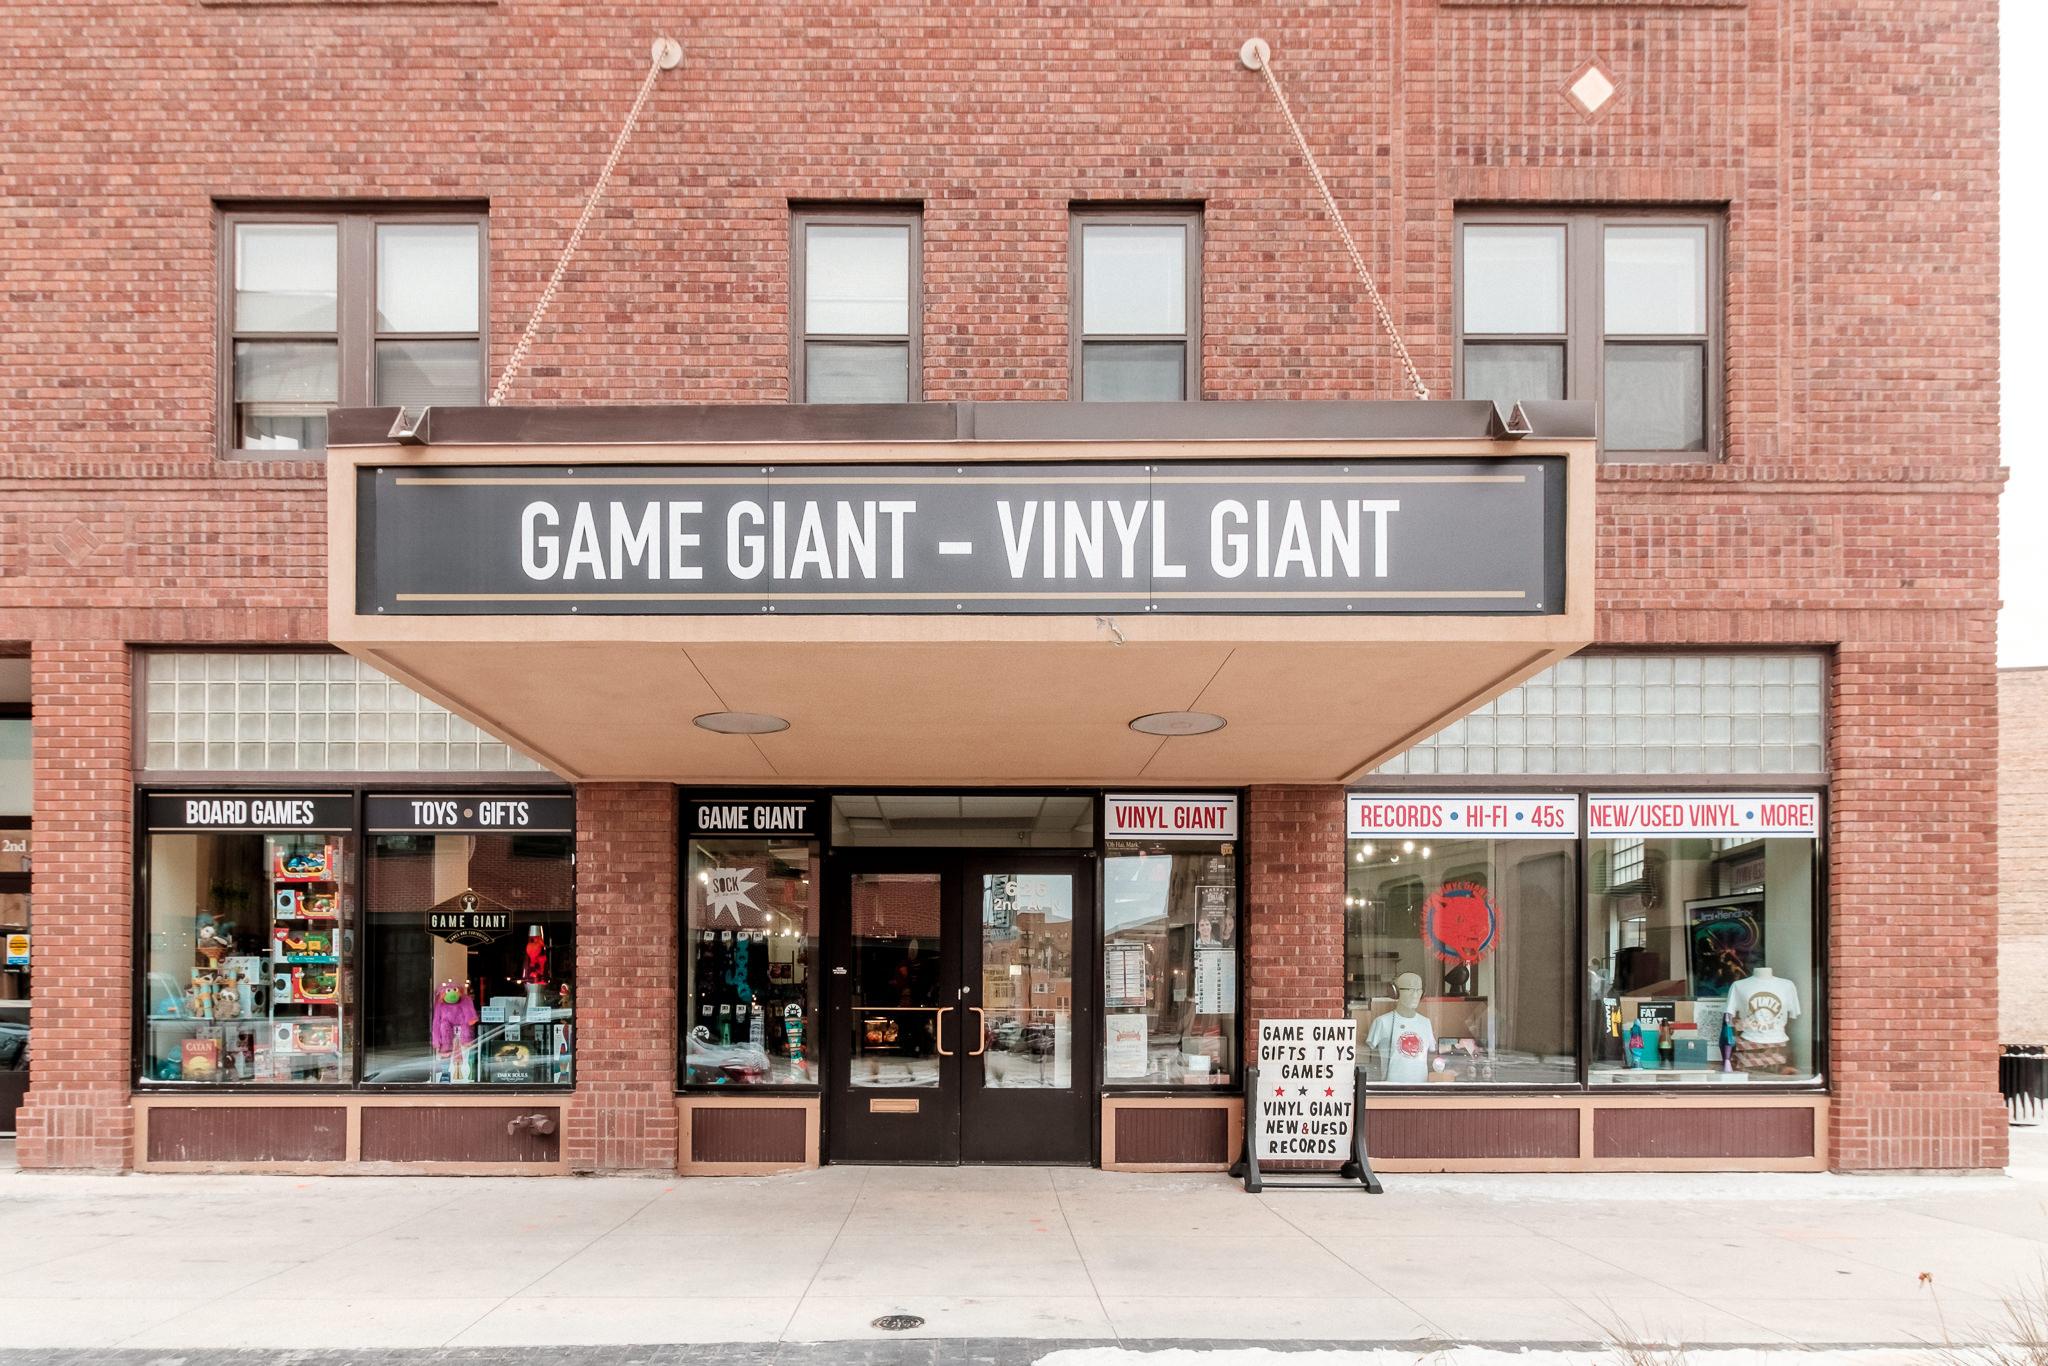 Game Giant - Vinyl Giant